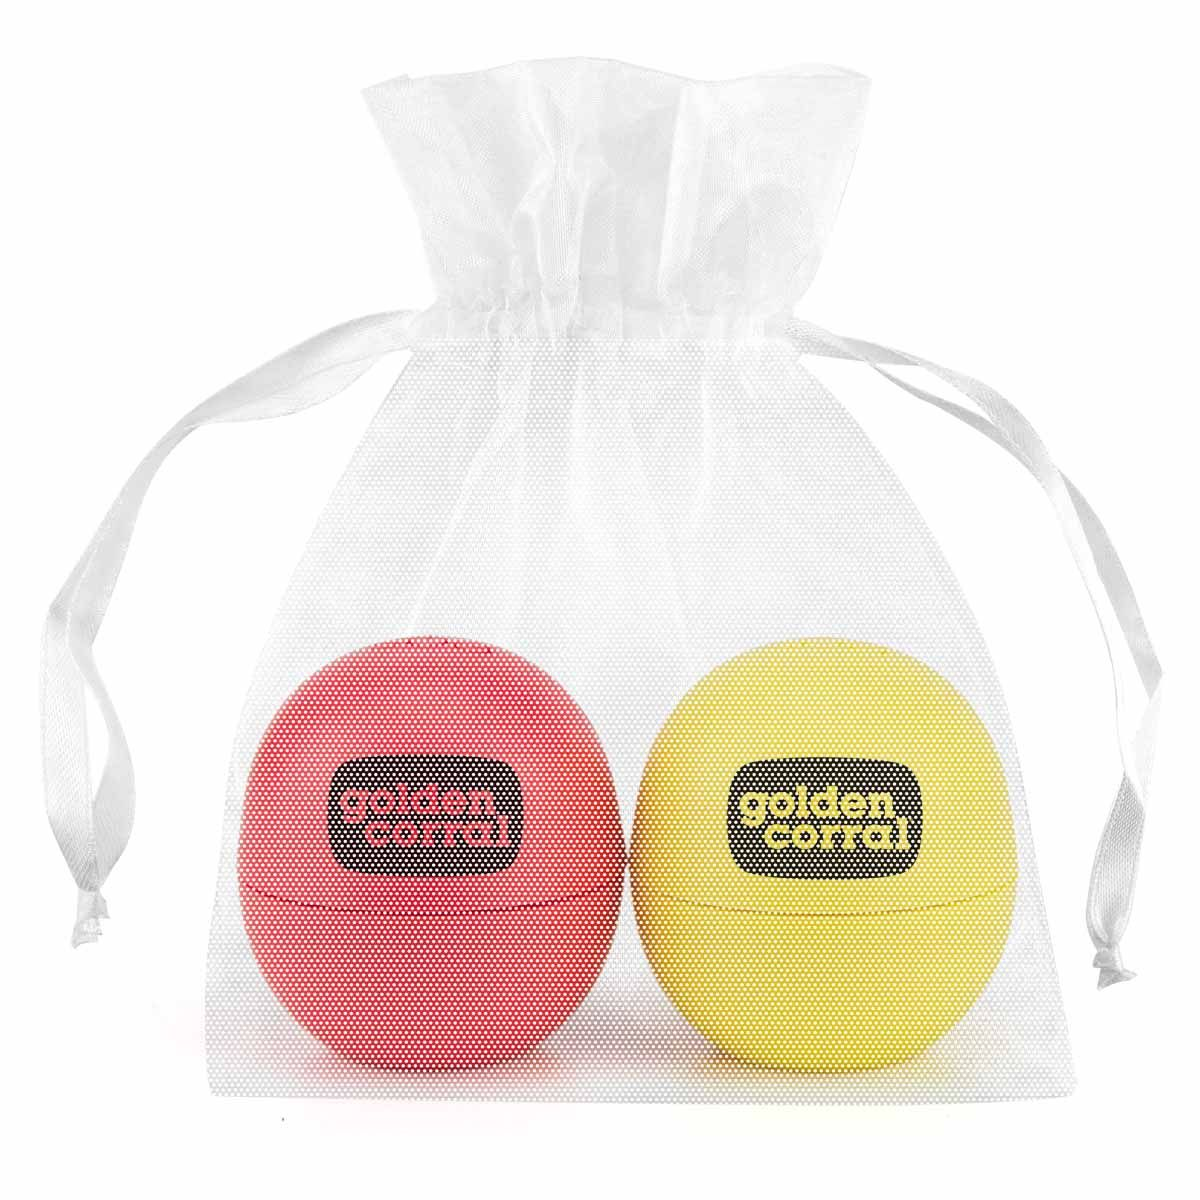 Health & Beauty EOS™ Lip Balm Kit Sports Fitness